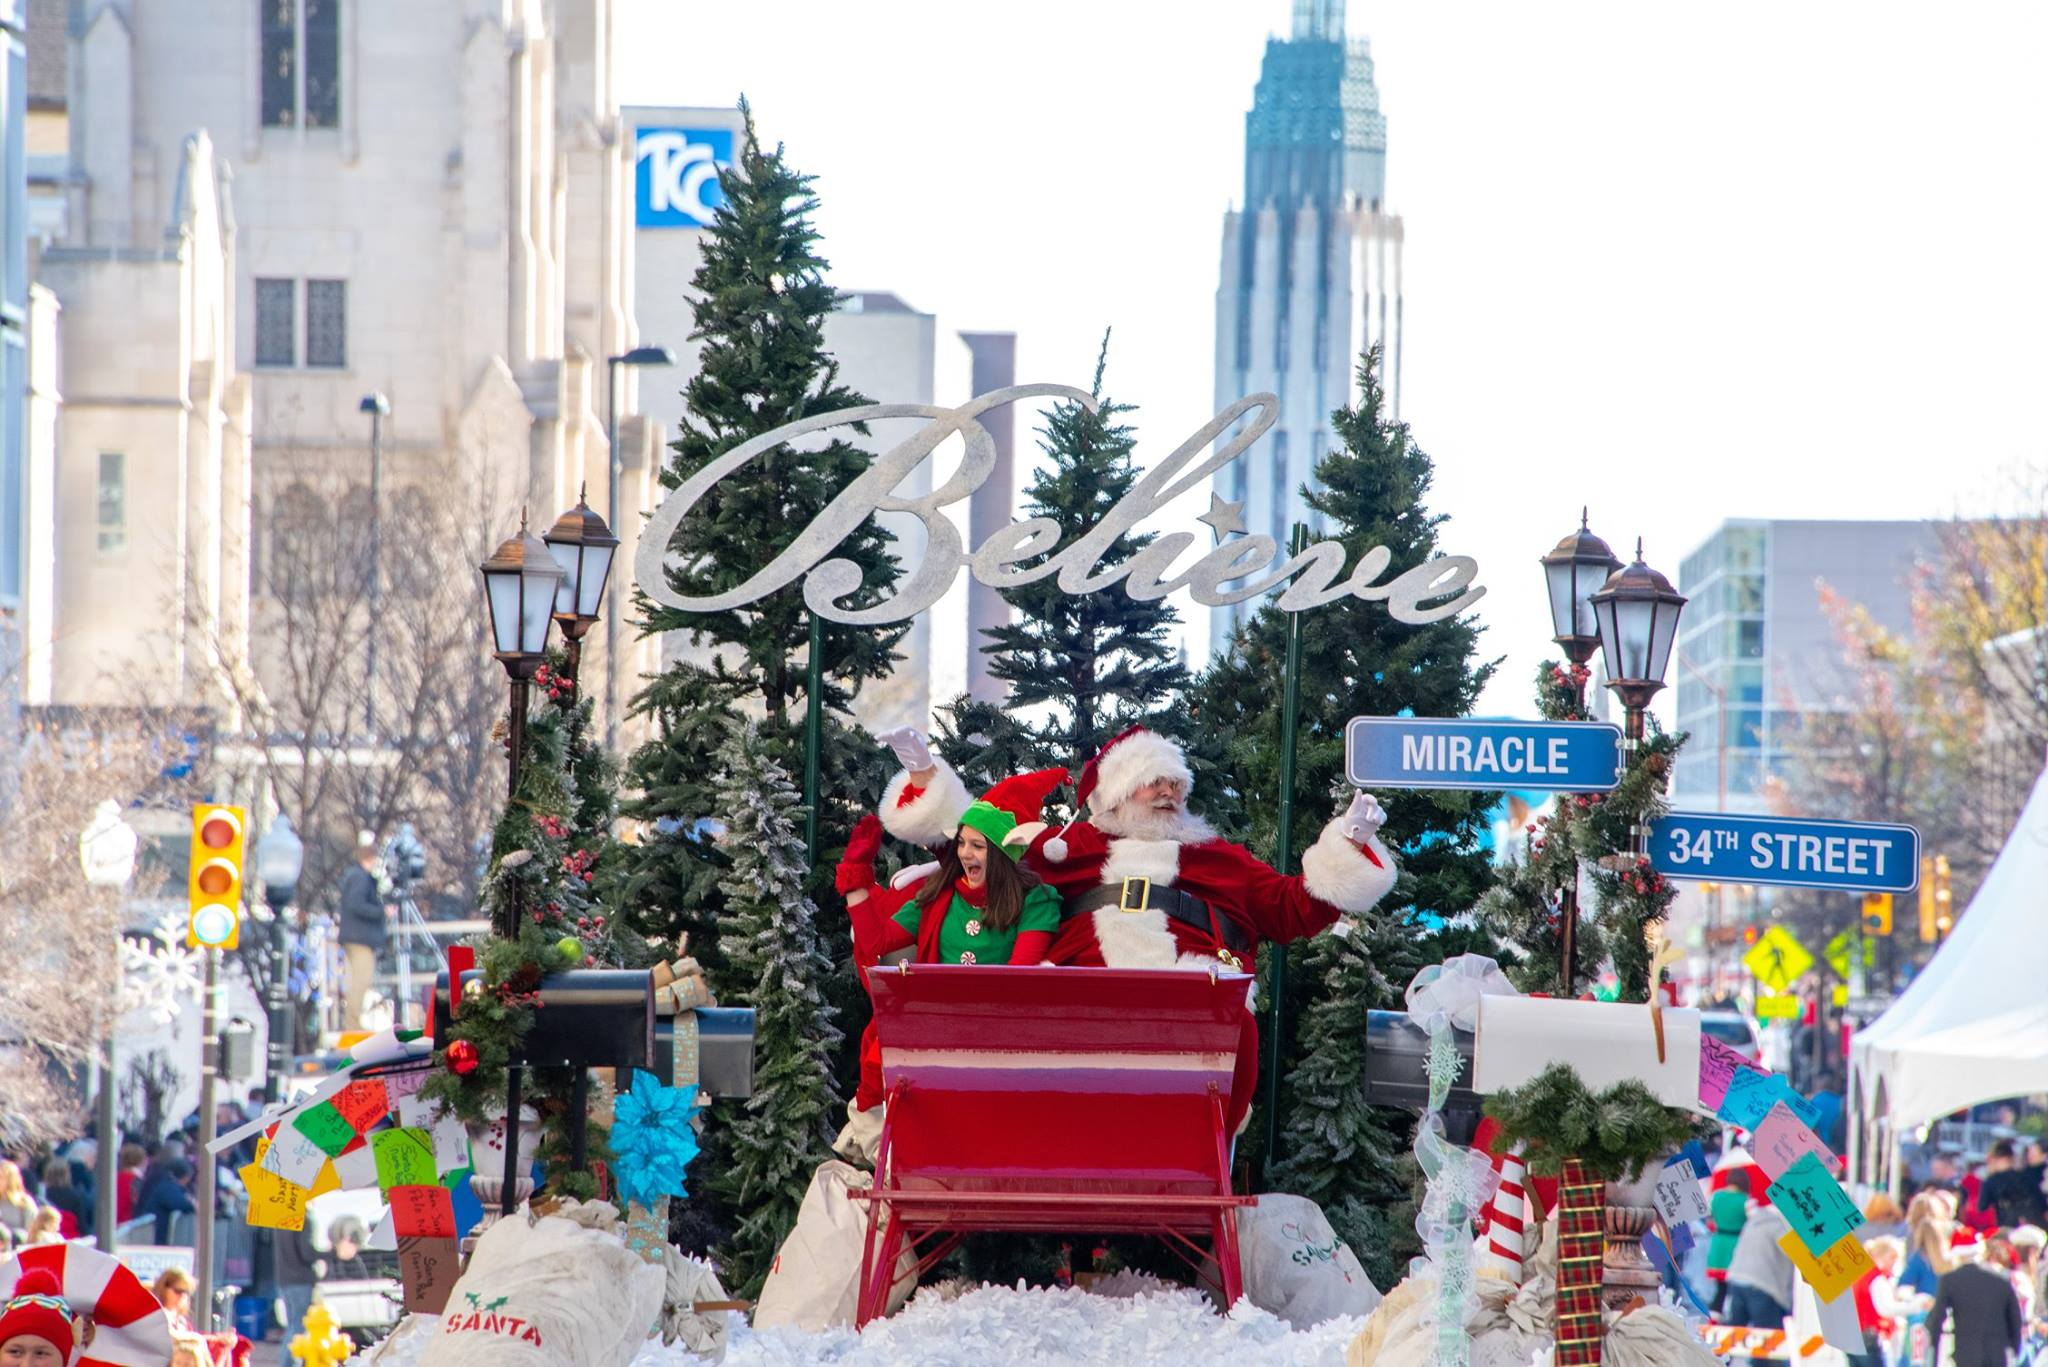 Oklahoma Christmas Parade 2020 Tulsa Makes Plans for 2020 Christmas Parade – The Floridant